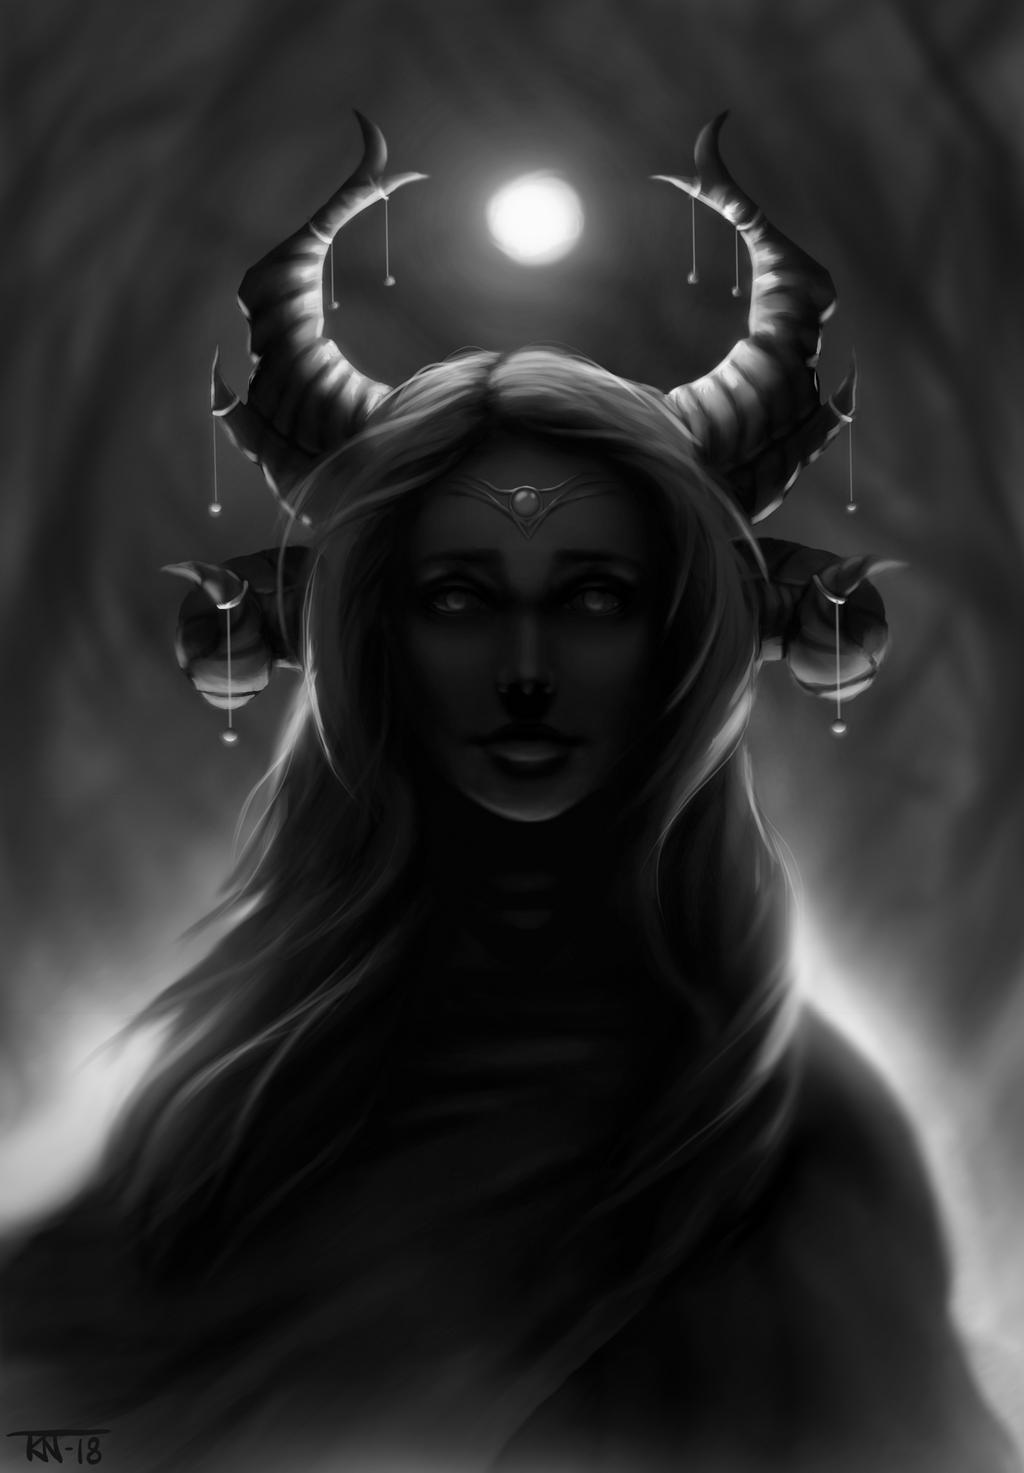 Lunar dragon queen by trinemusen1